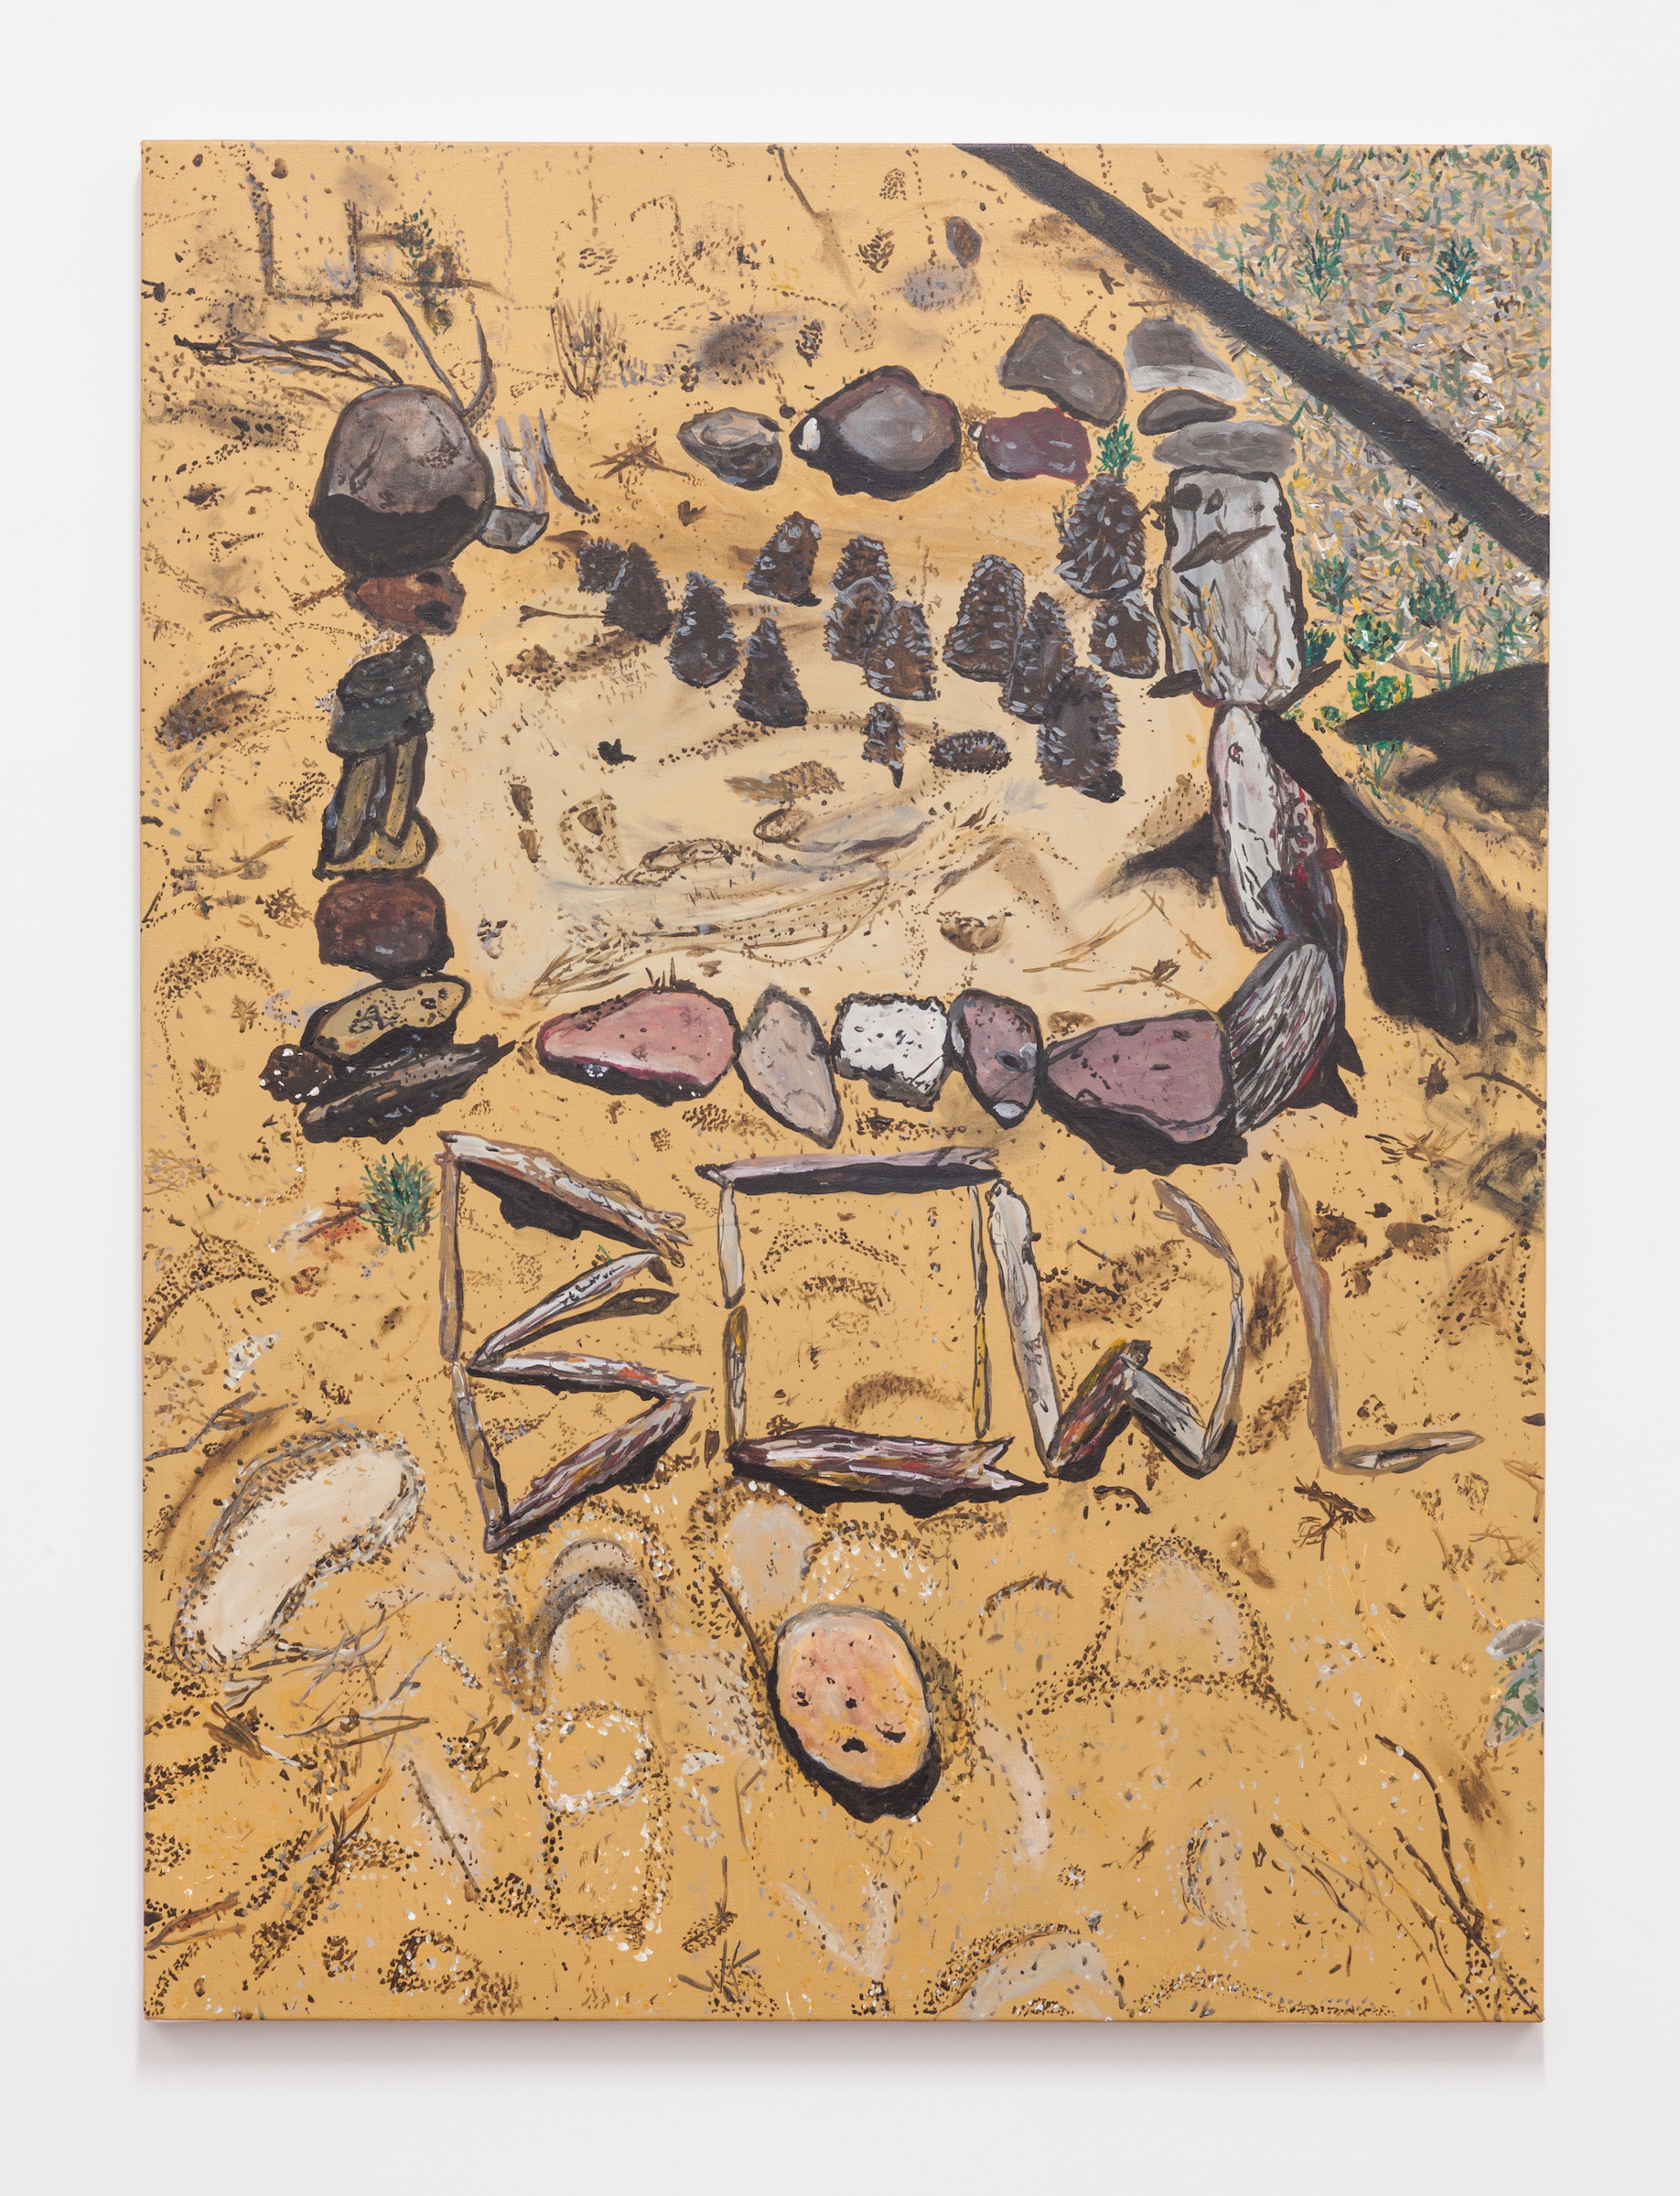 Jocko Weyland, Bowl , 2014,acrylic on canvas,48 x 36 in